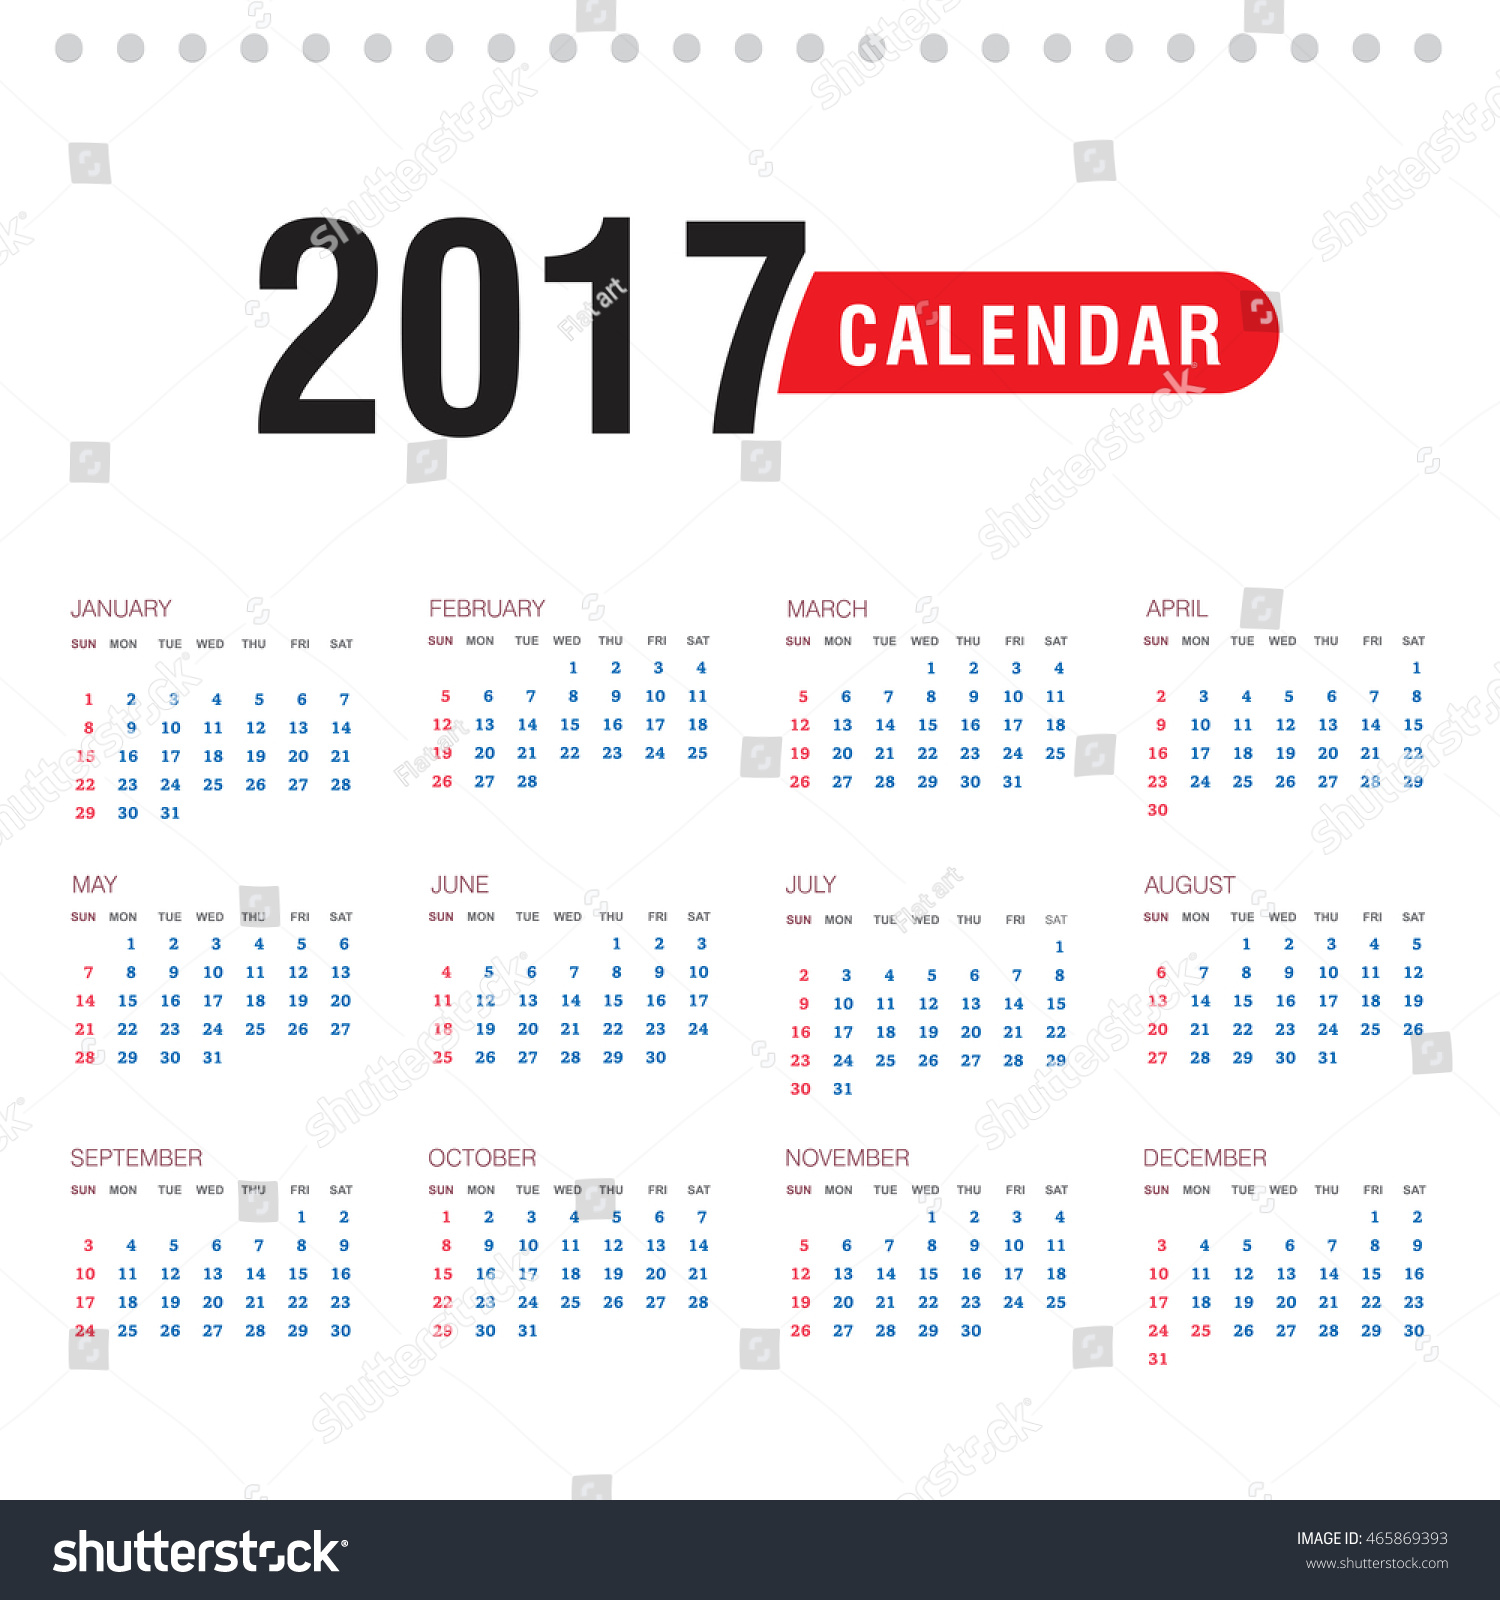 Calendar Flat Illustration : Calendar flat design vector